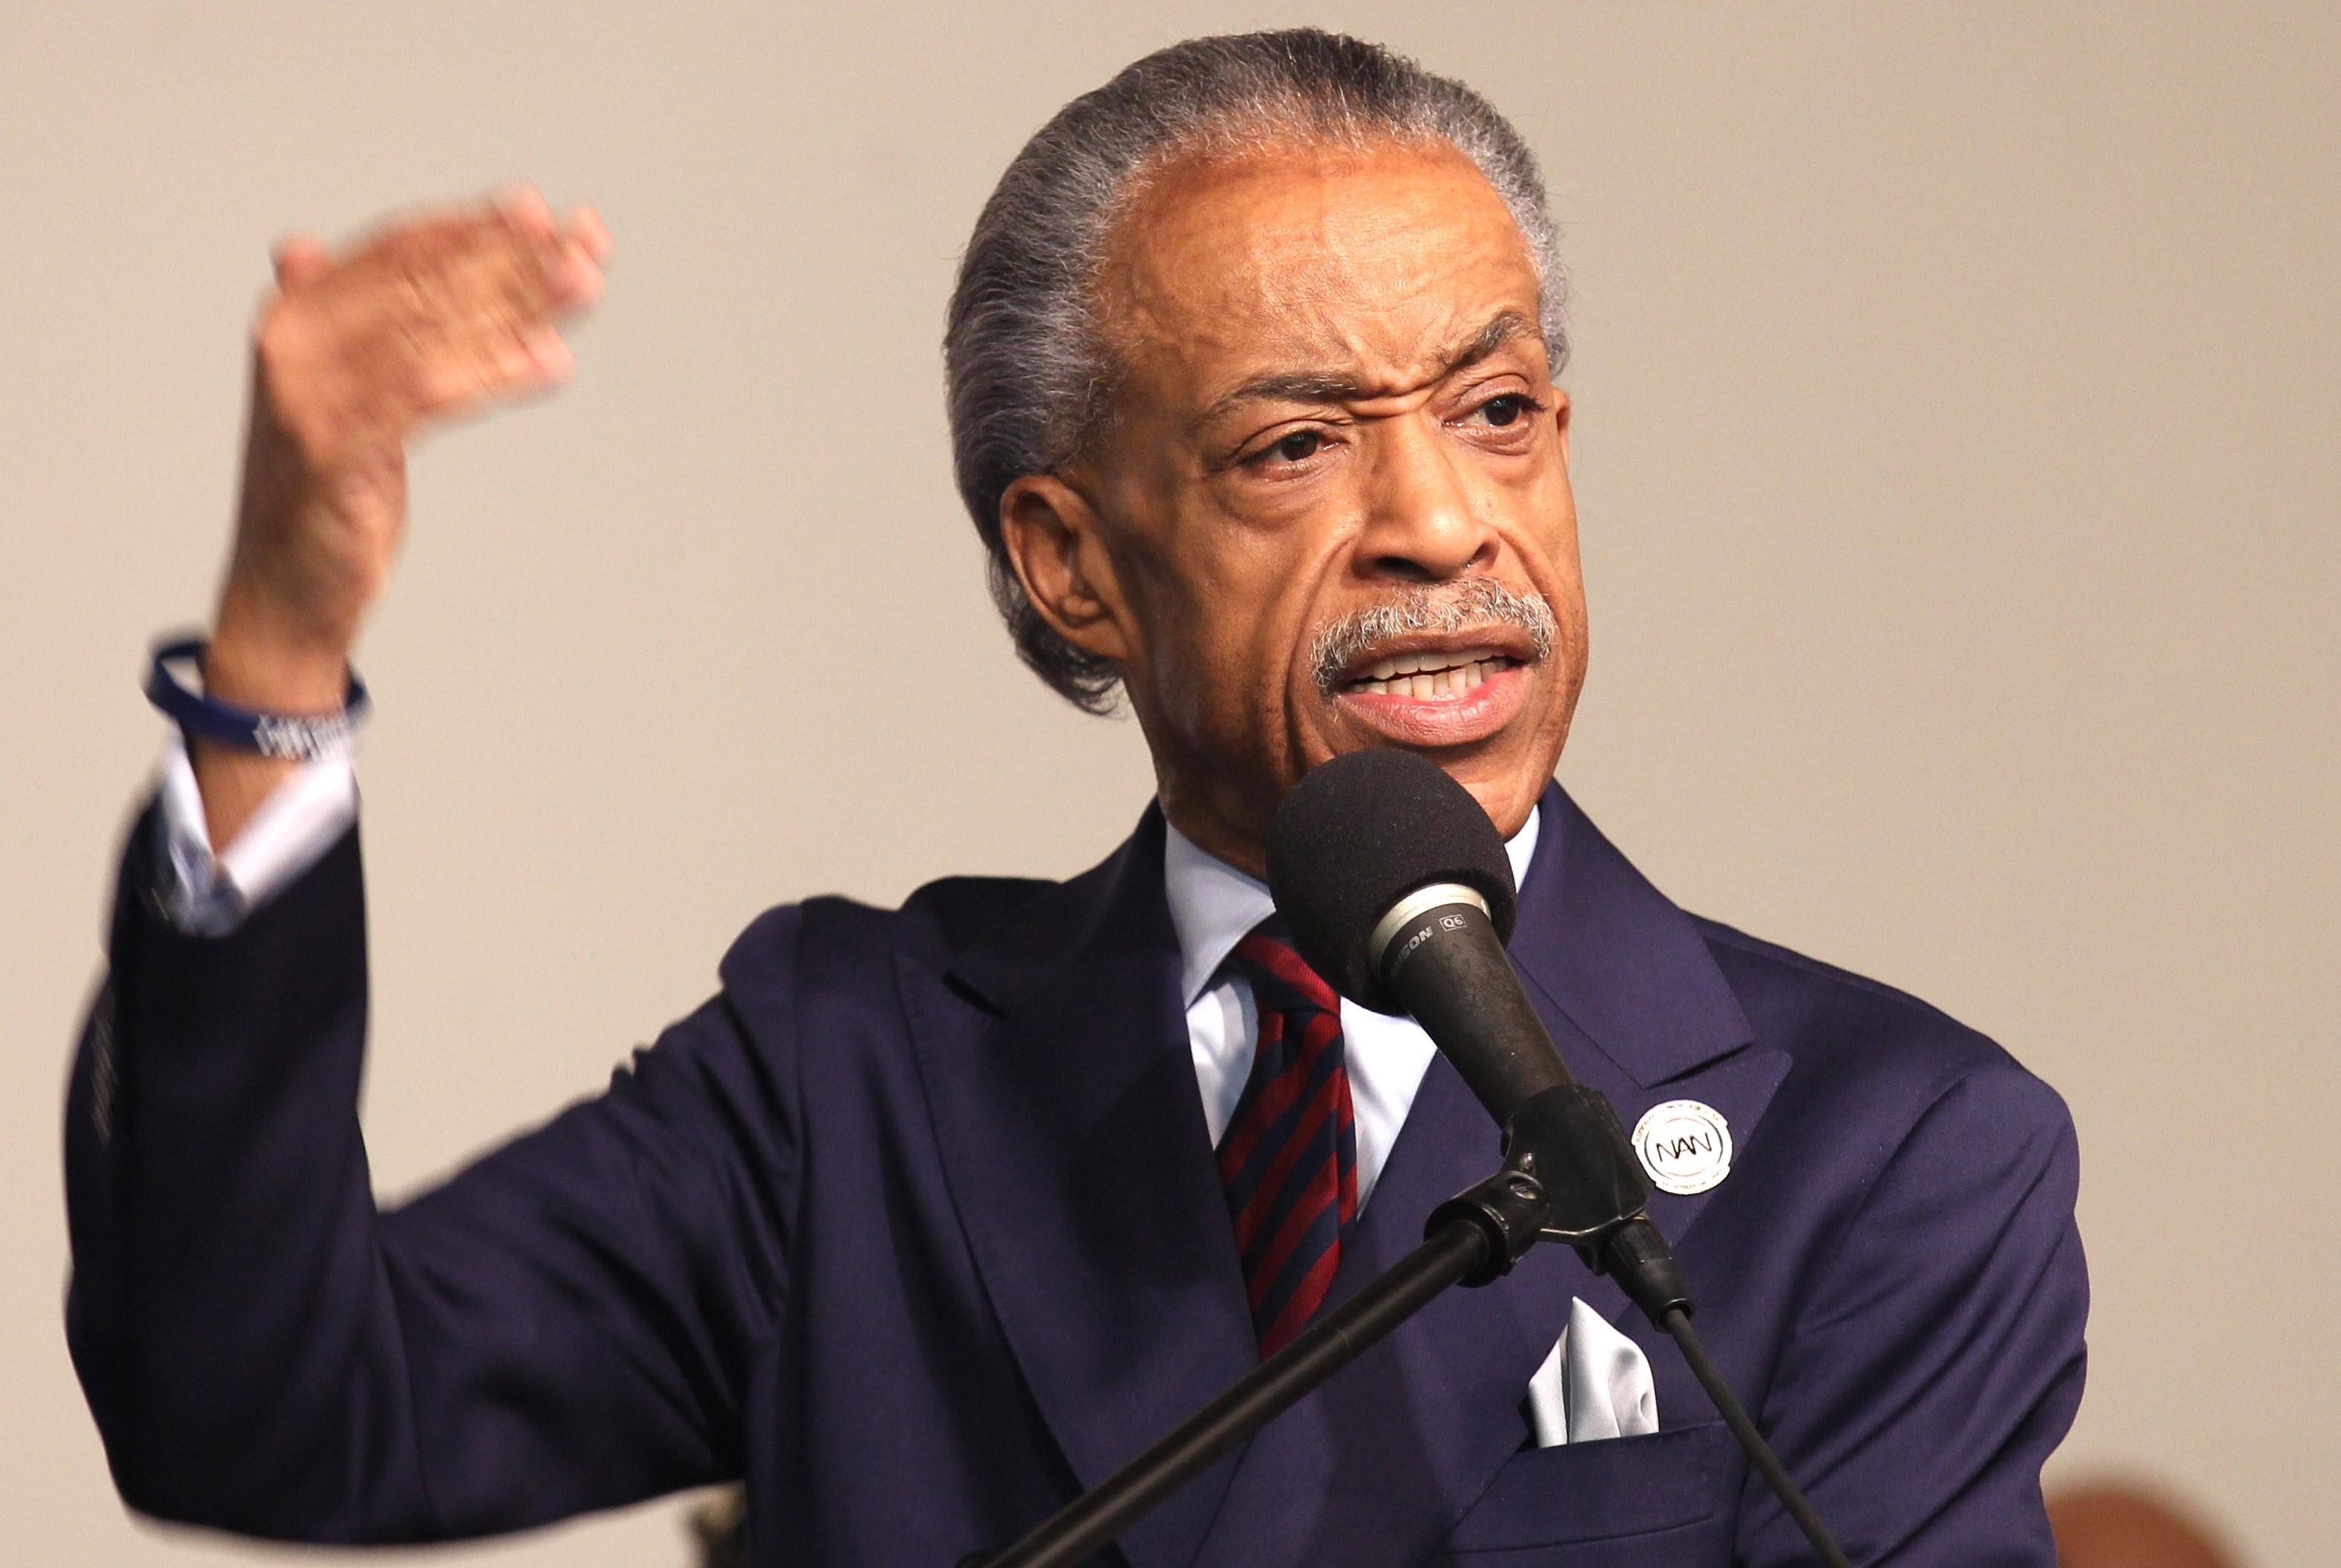 Al Sharpton: Progressive Democrats 'shortchanging' African ...